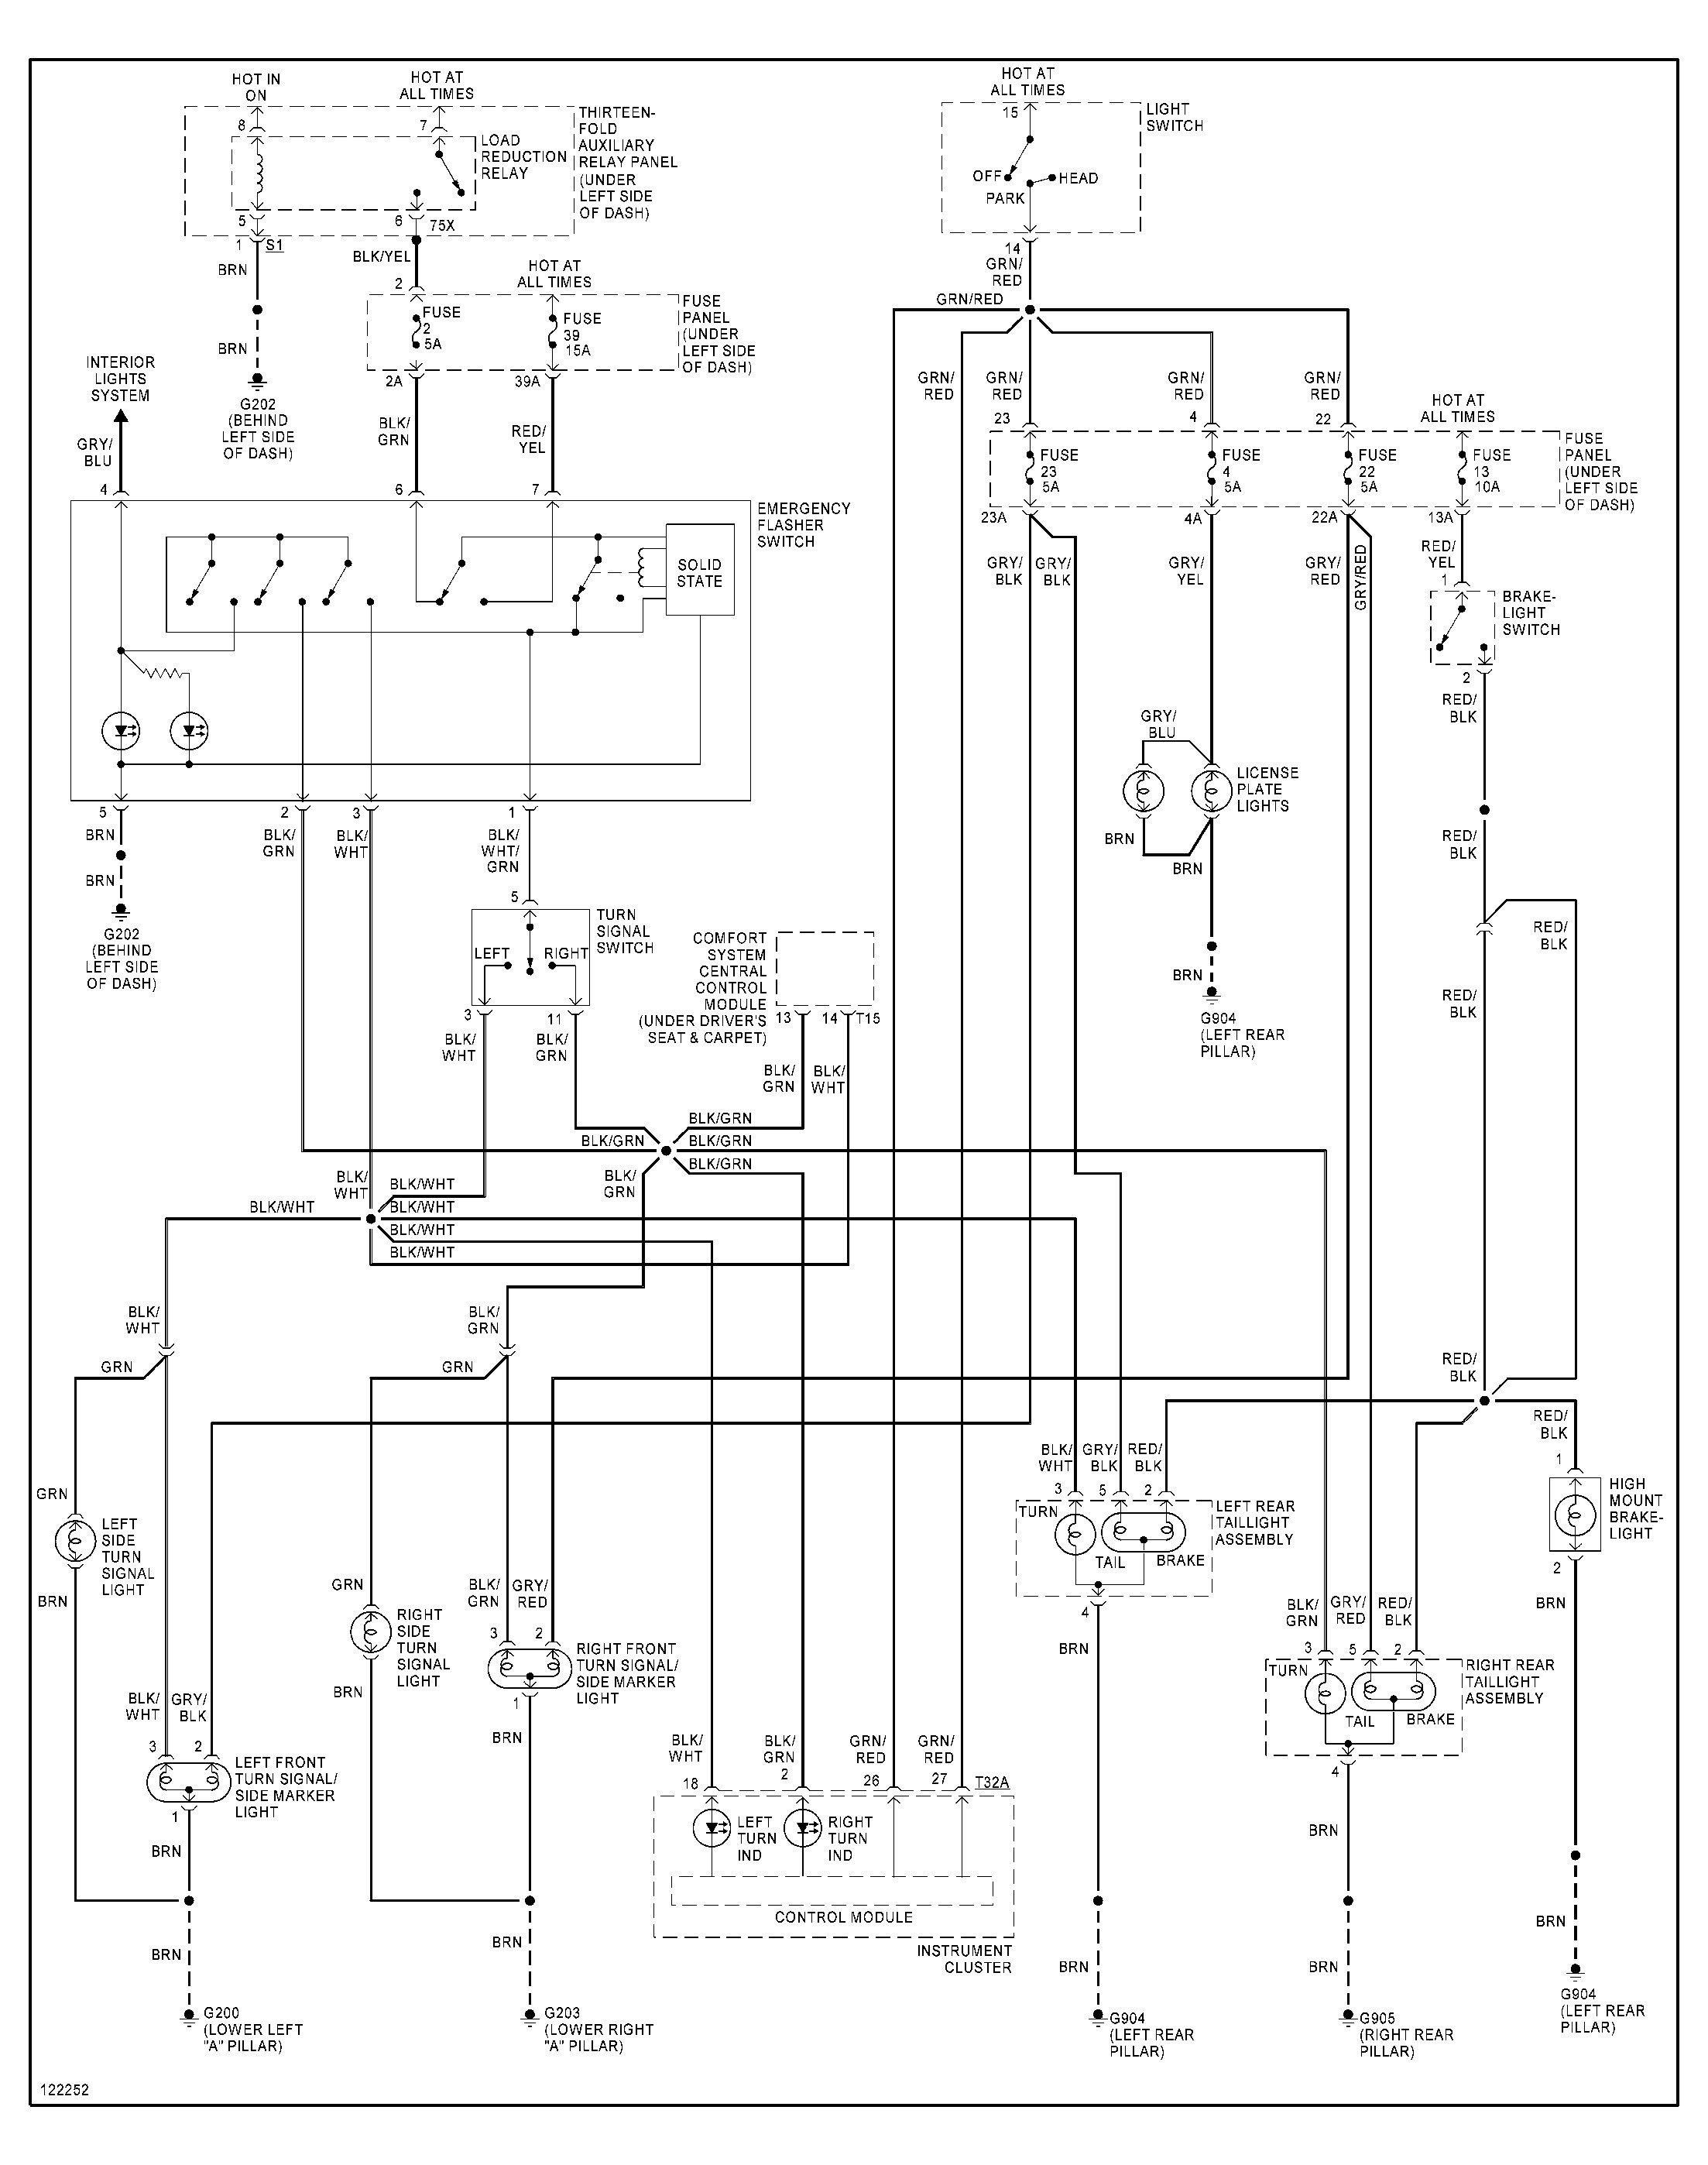 New Understanding Automotive Wiring Diagram Diagram